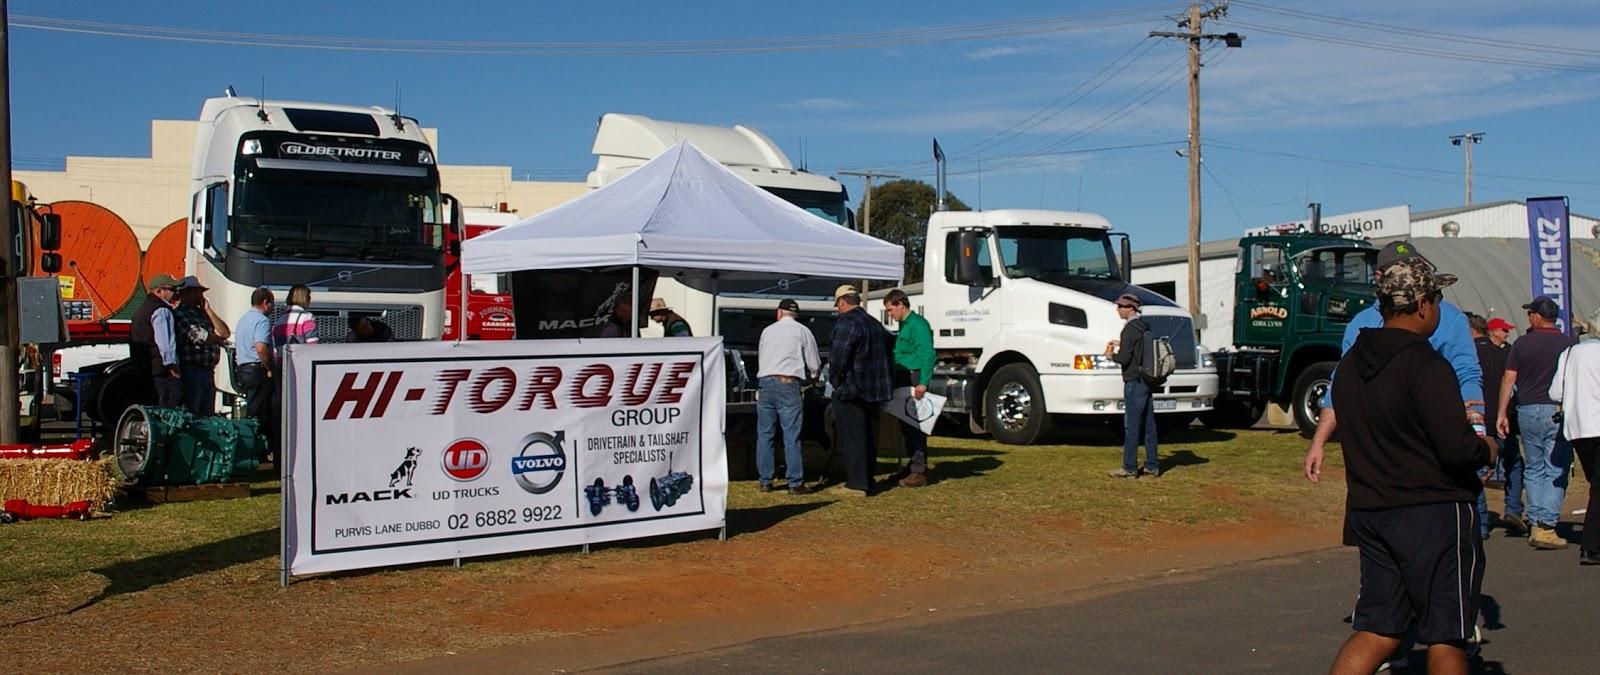 hi torque truck parts dubbo presbyterian - photo#21